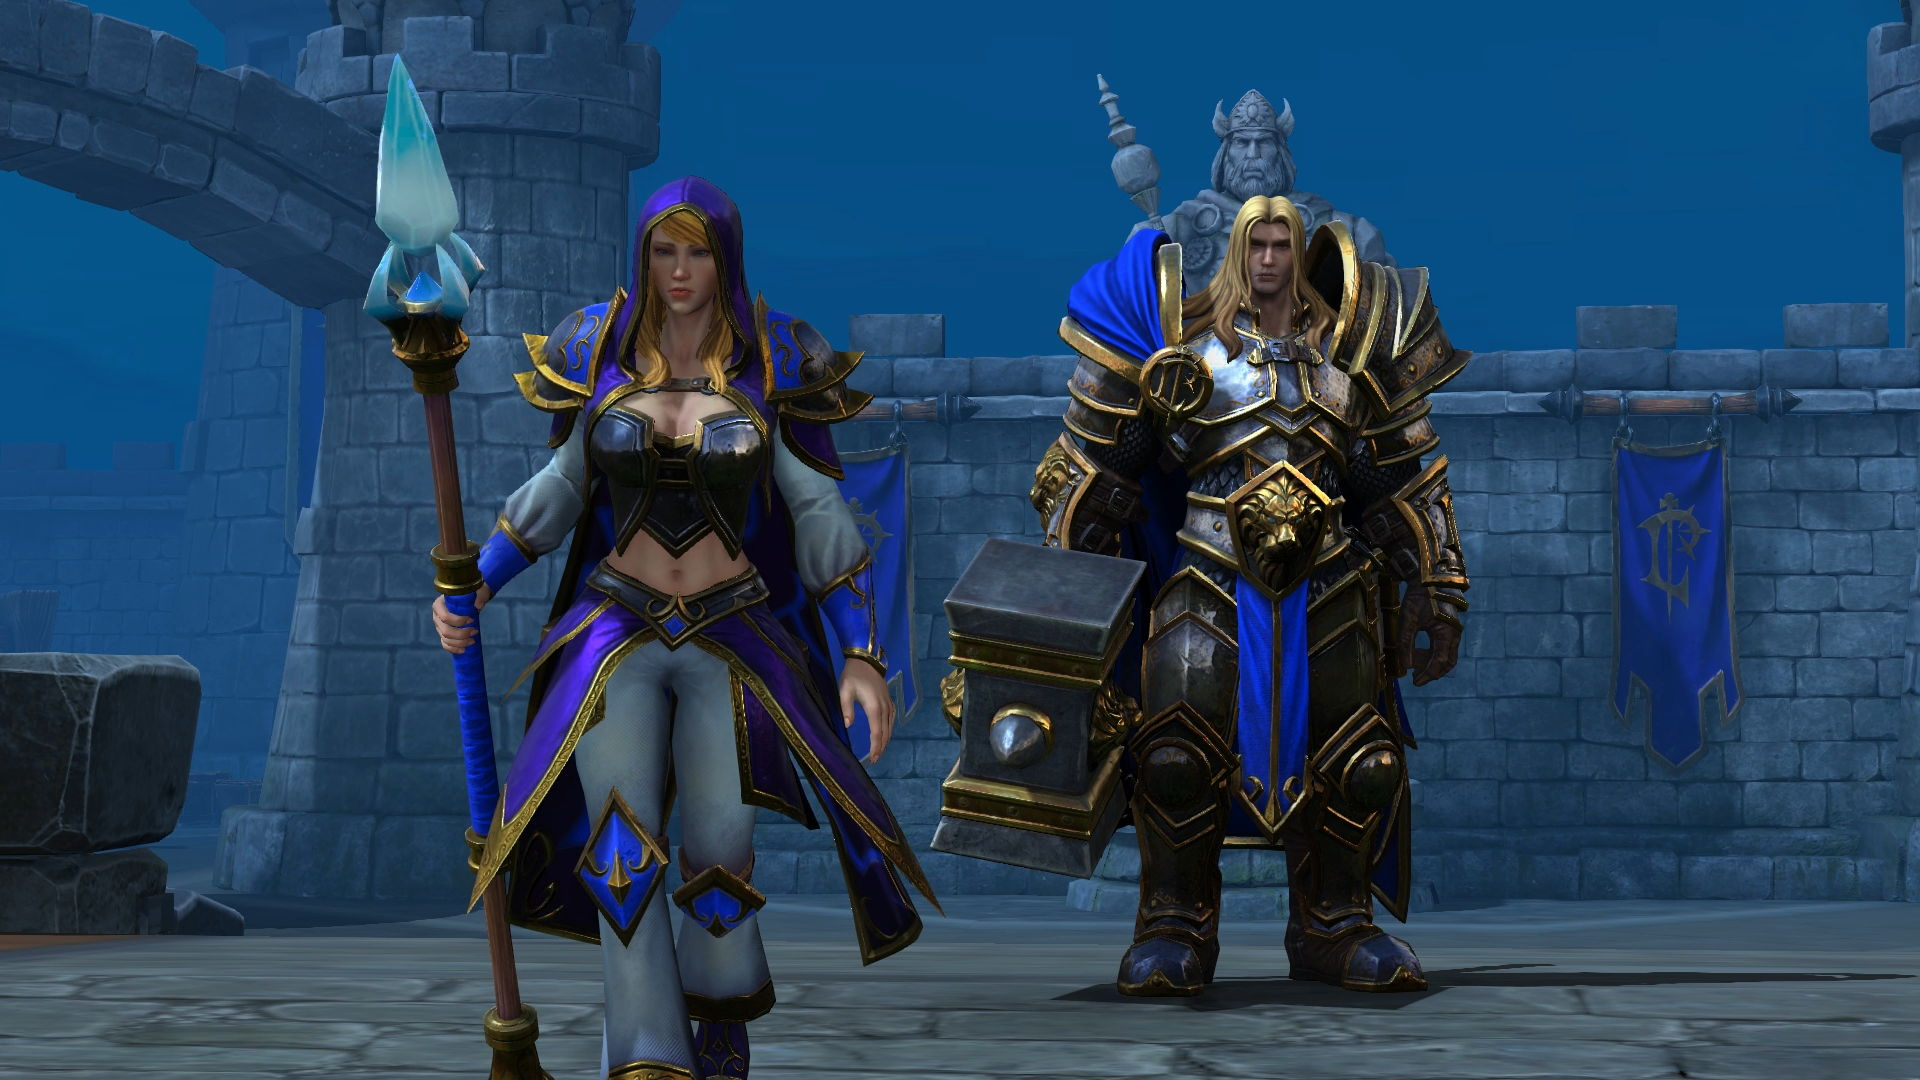 Jaina Portvaillant et Arthas Menethil, les héros humains de Warcraft III: Reforged